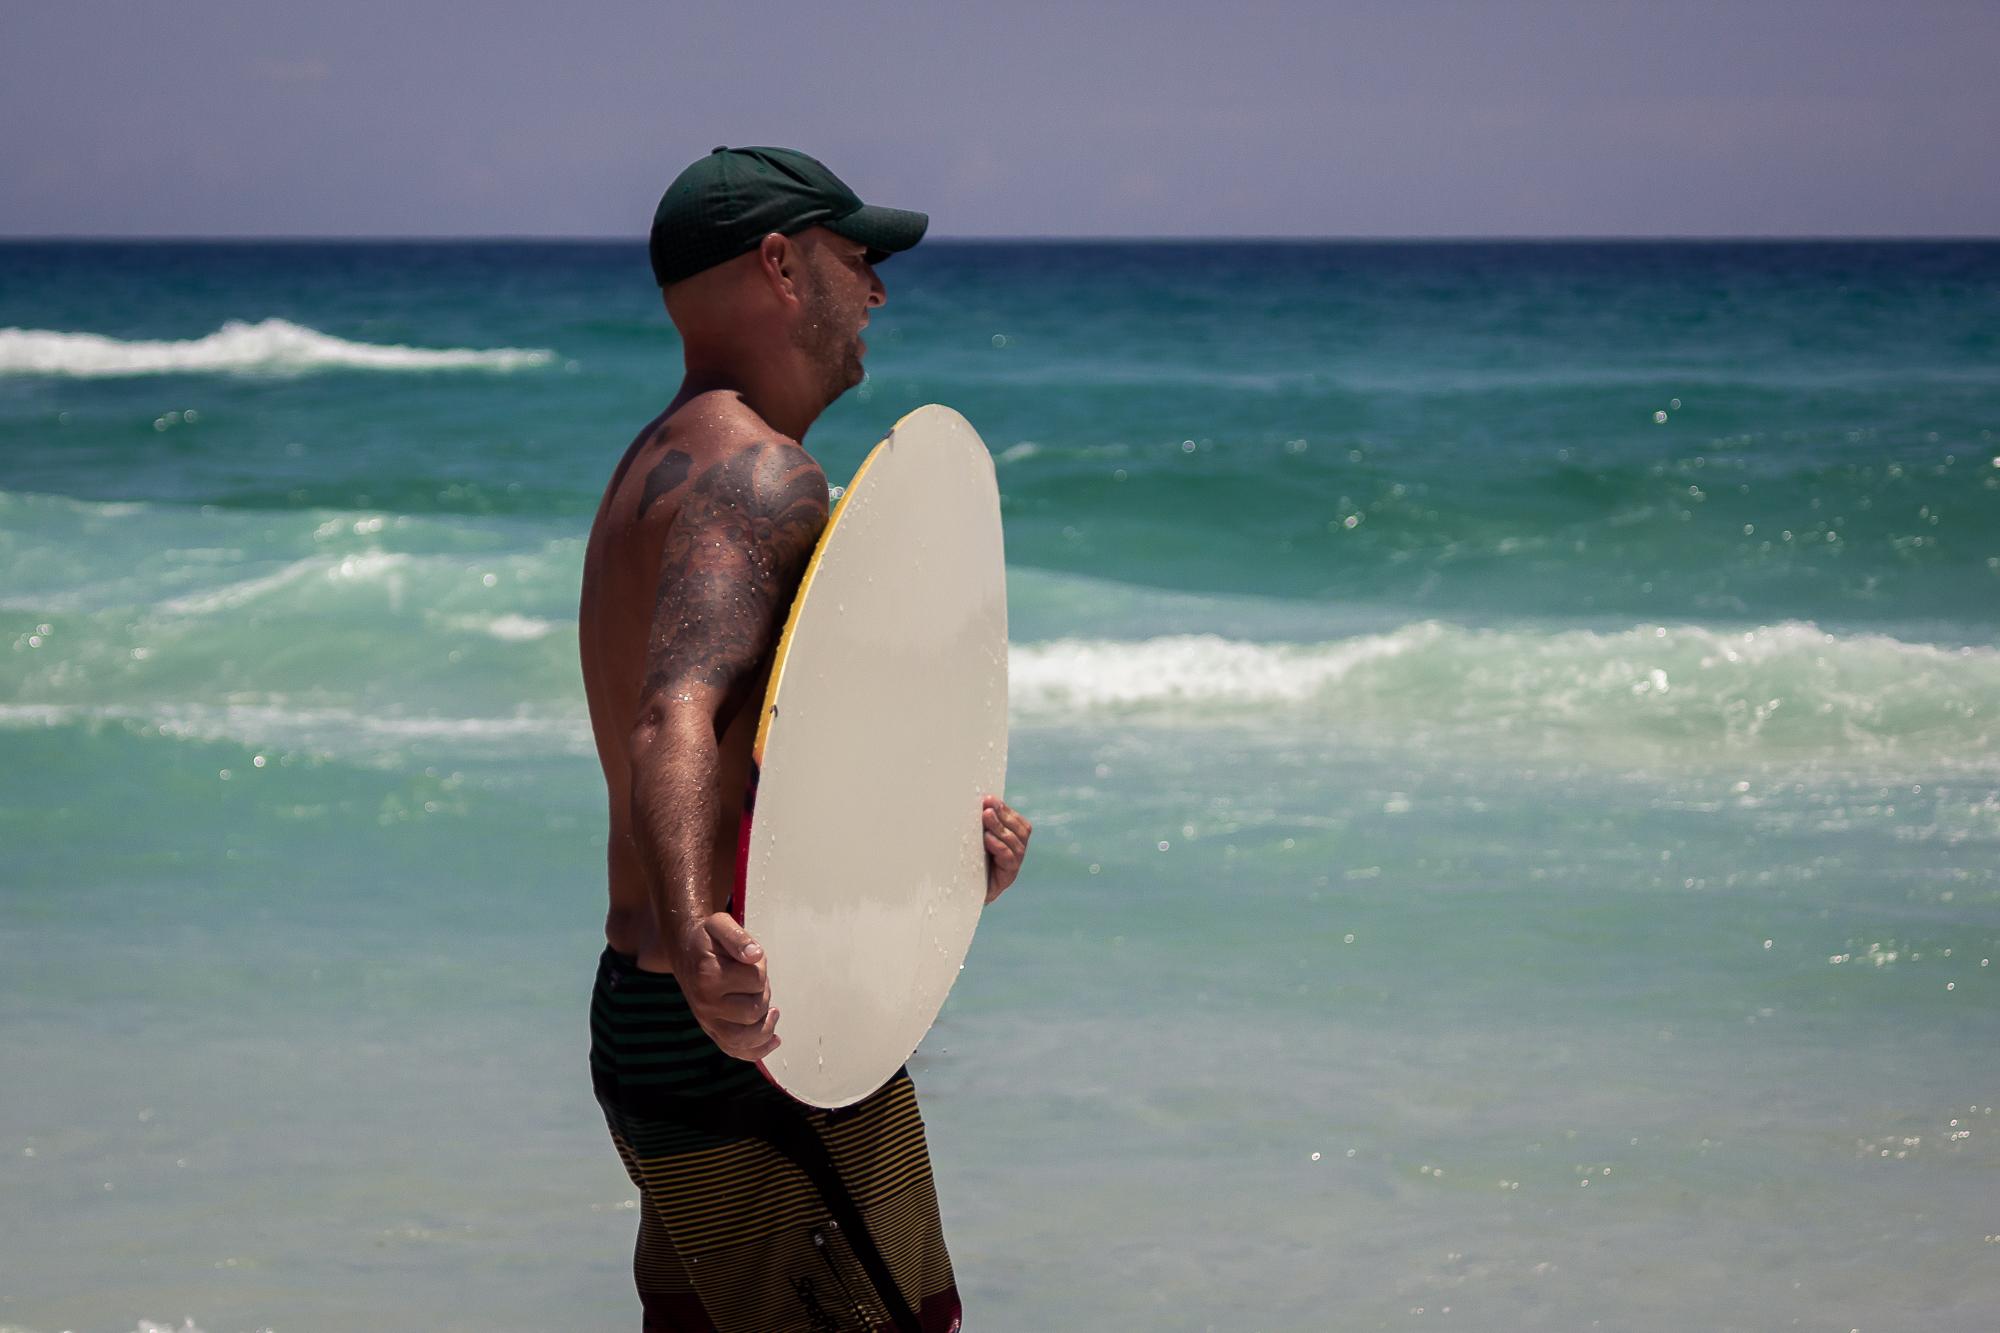 Wakeboarder on the beach in Destin, FL.